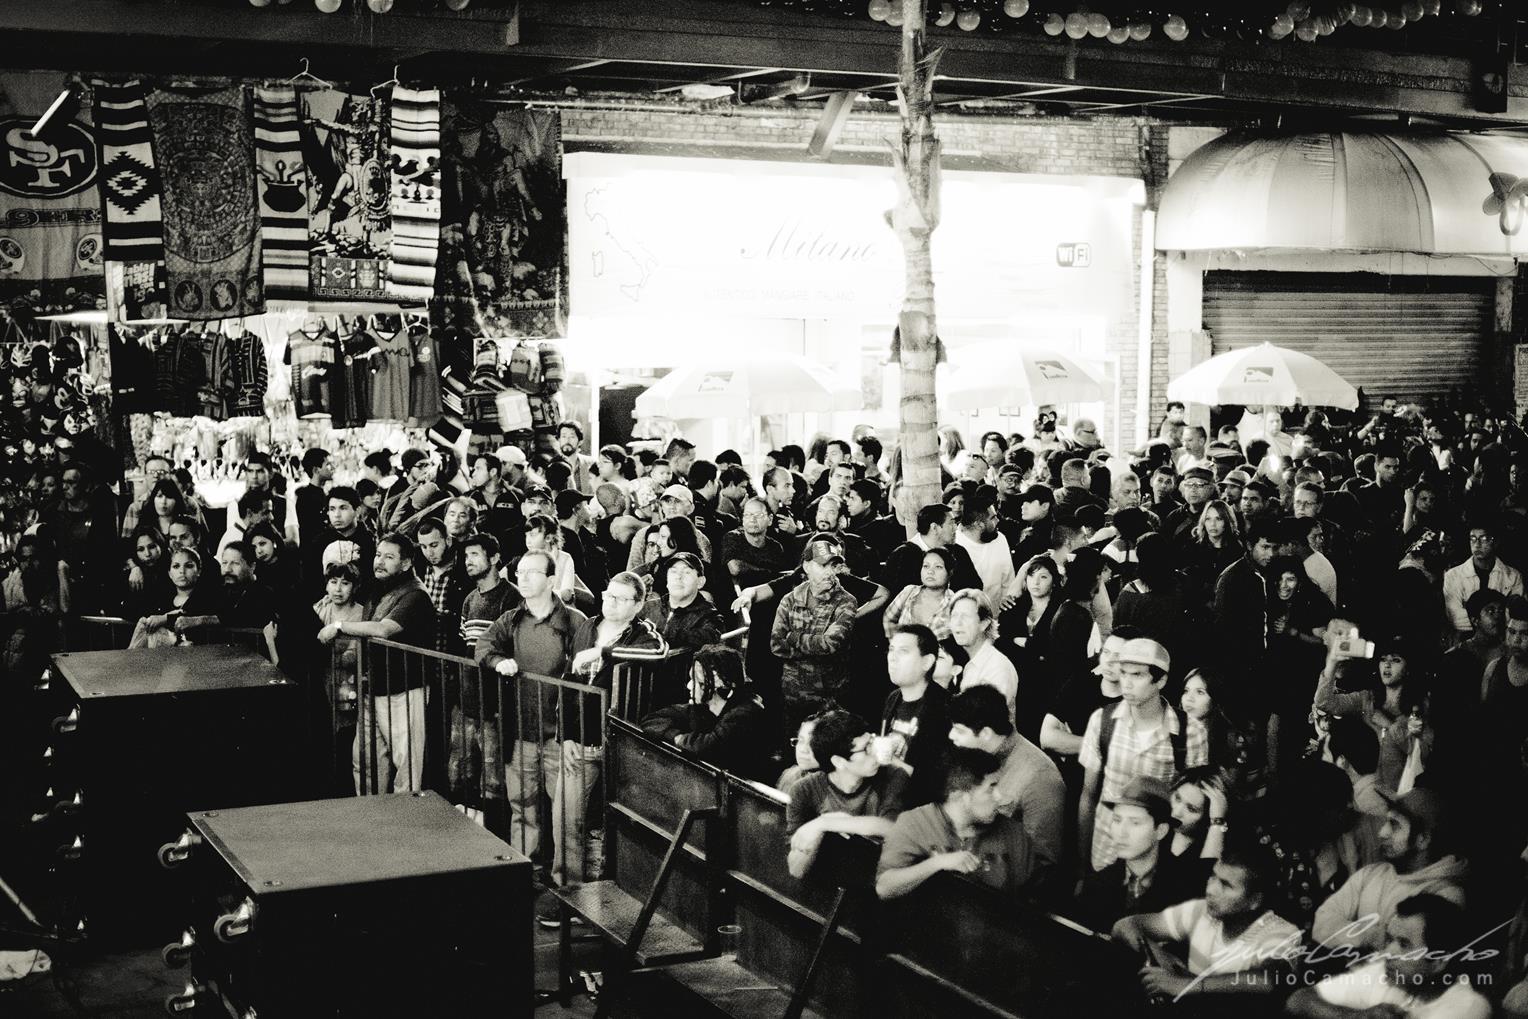 2014-10-30 31 CAST TOUR Ensenada y Tijuana - 1569 - www.Juli (Copy).jpg